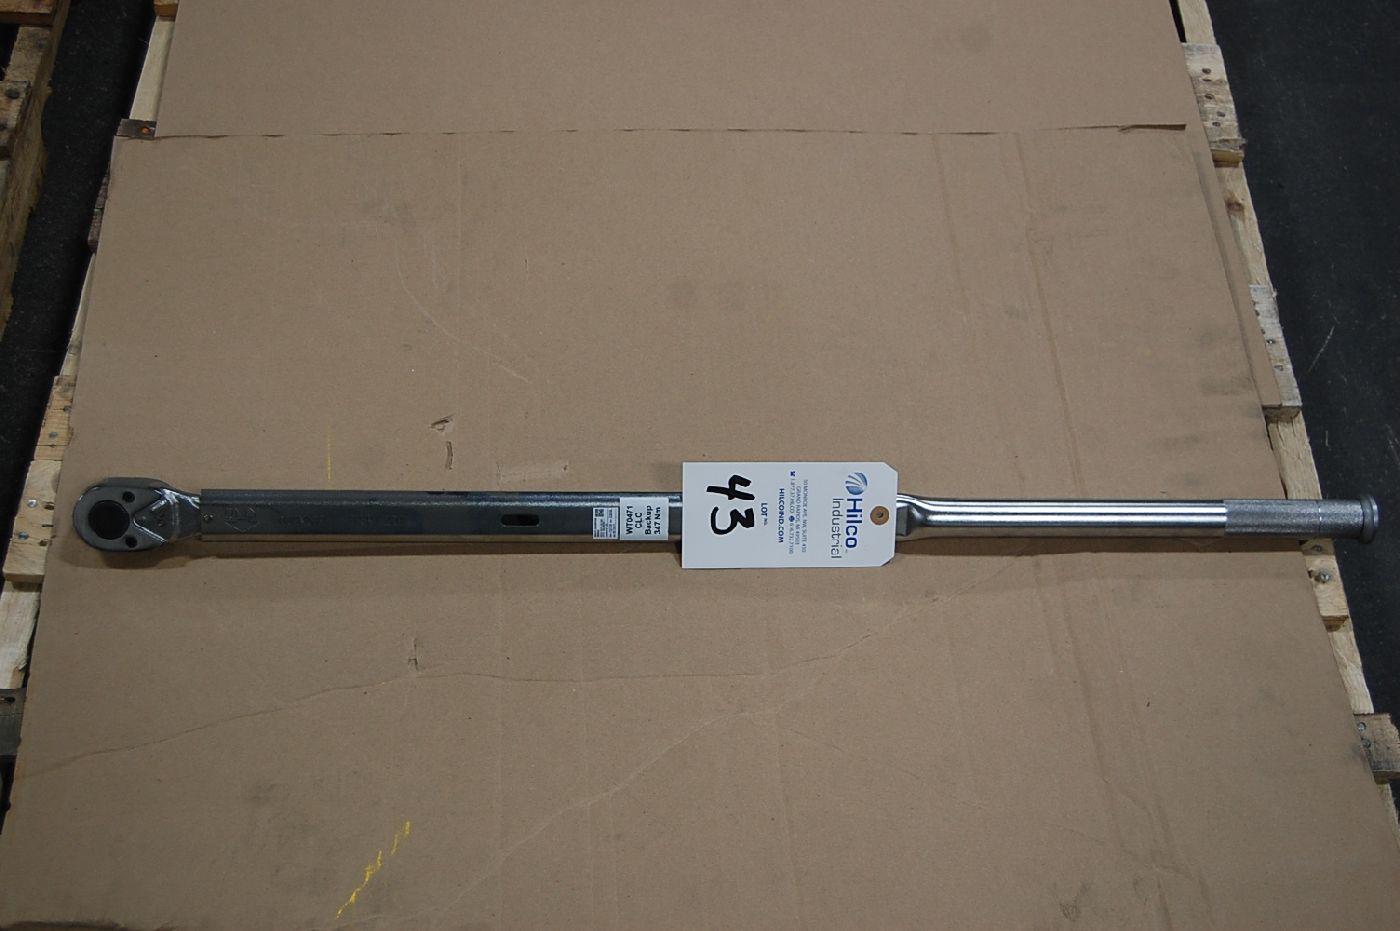 Lot 43 - Tohnichi Model QSP420N 256 Ft. Lb. Torque Wrench